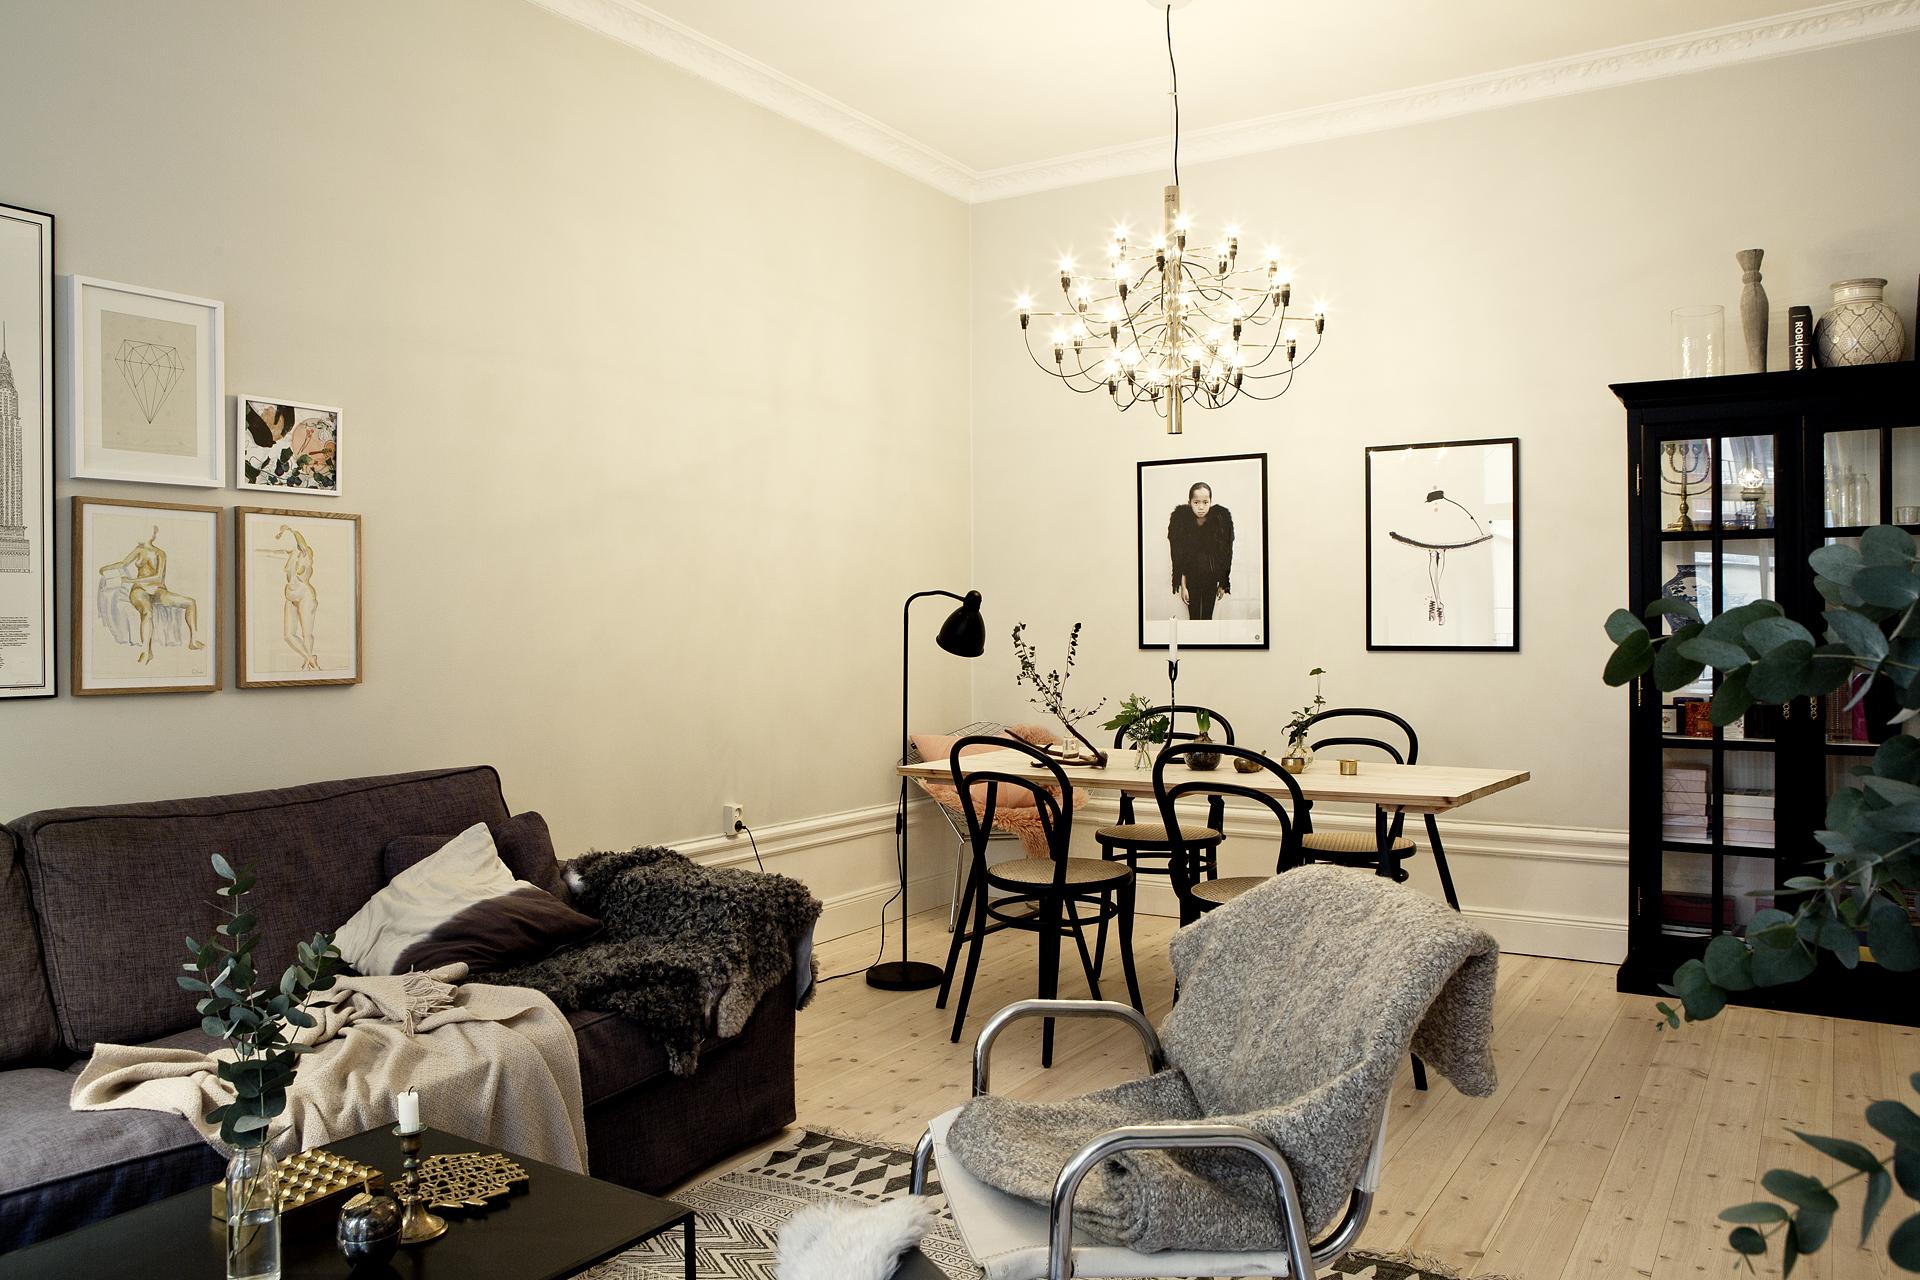 C lido estilo n rdico con textiles e iluminaci n de for Decoracion salon estilo nordico